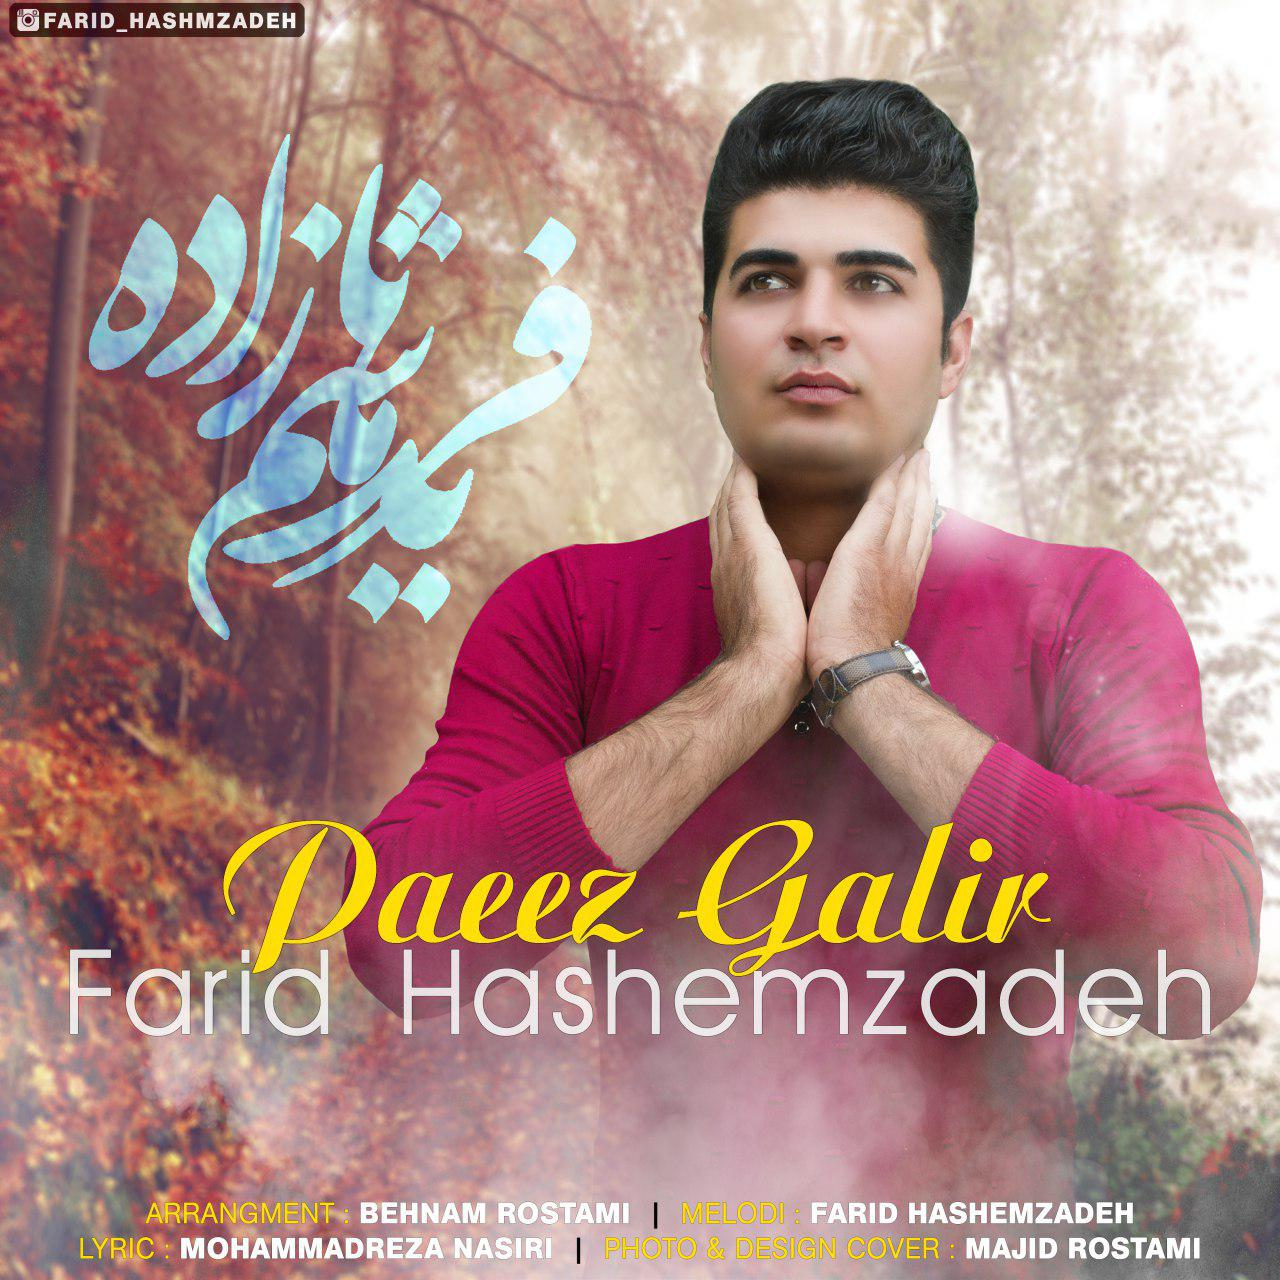 http://s8.picofile.com/file/8343281650/02Farid_Hashemzadeh_Paeez_Galir.jpg